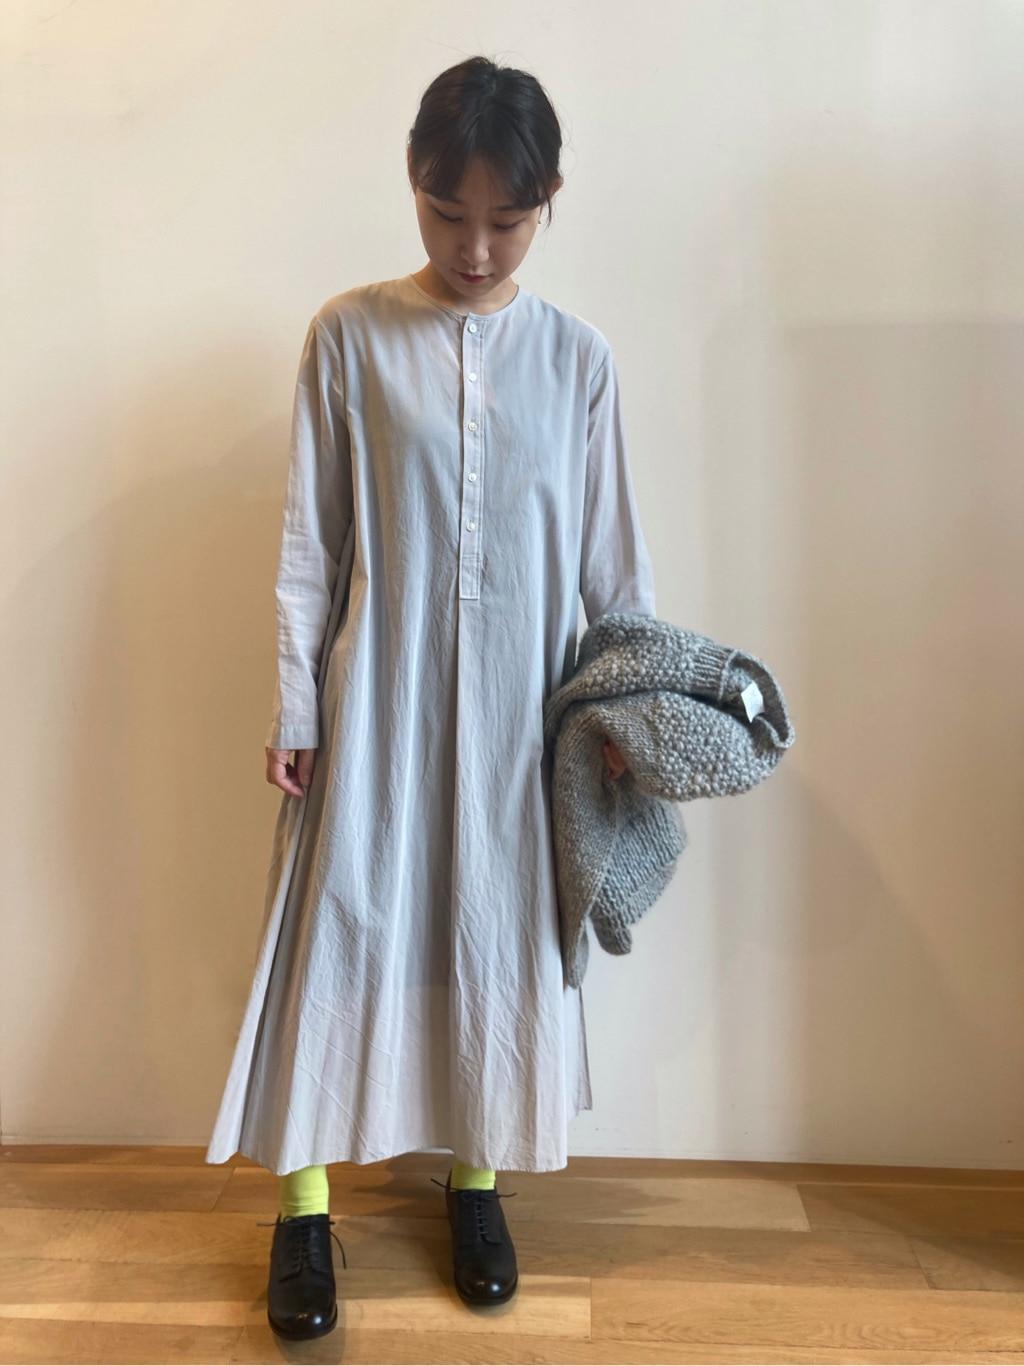 bulle de savon KITTE丸の内 身長:159cm 2020.09.14